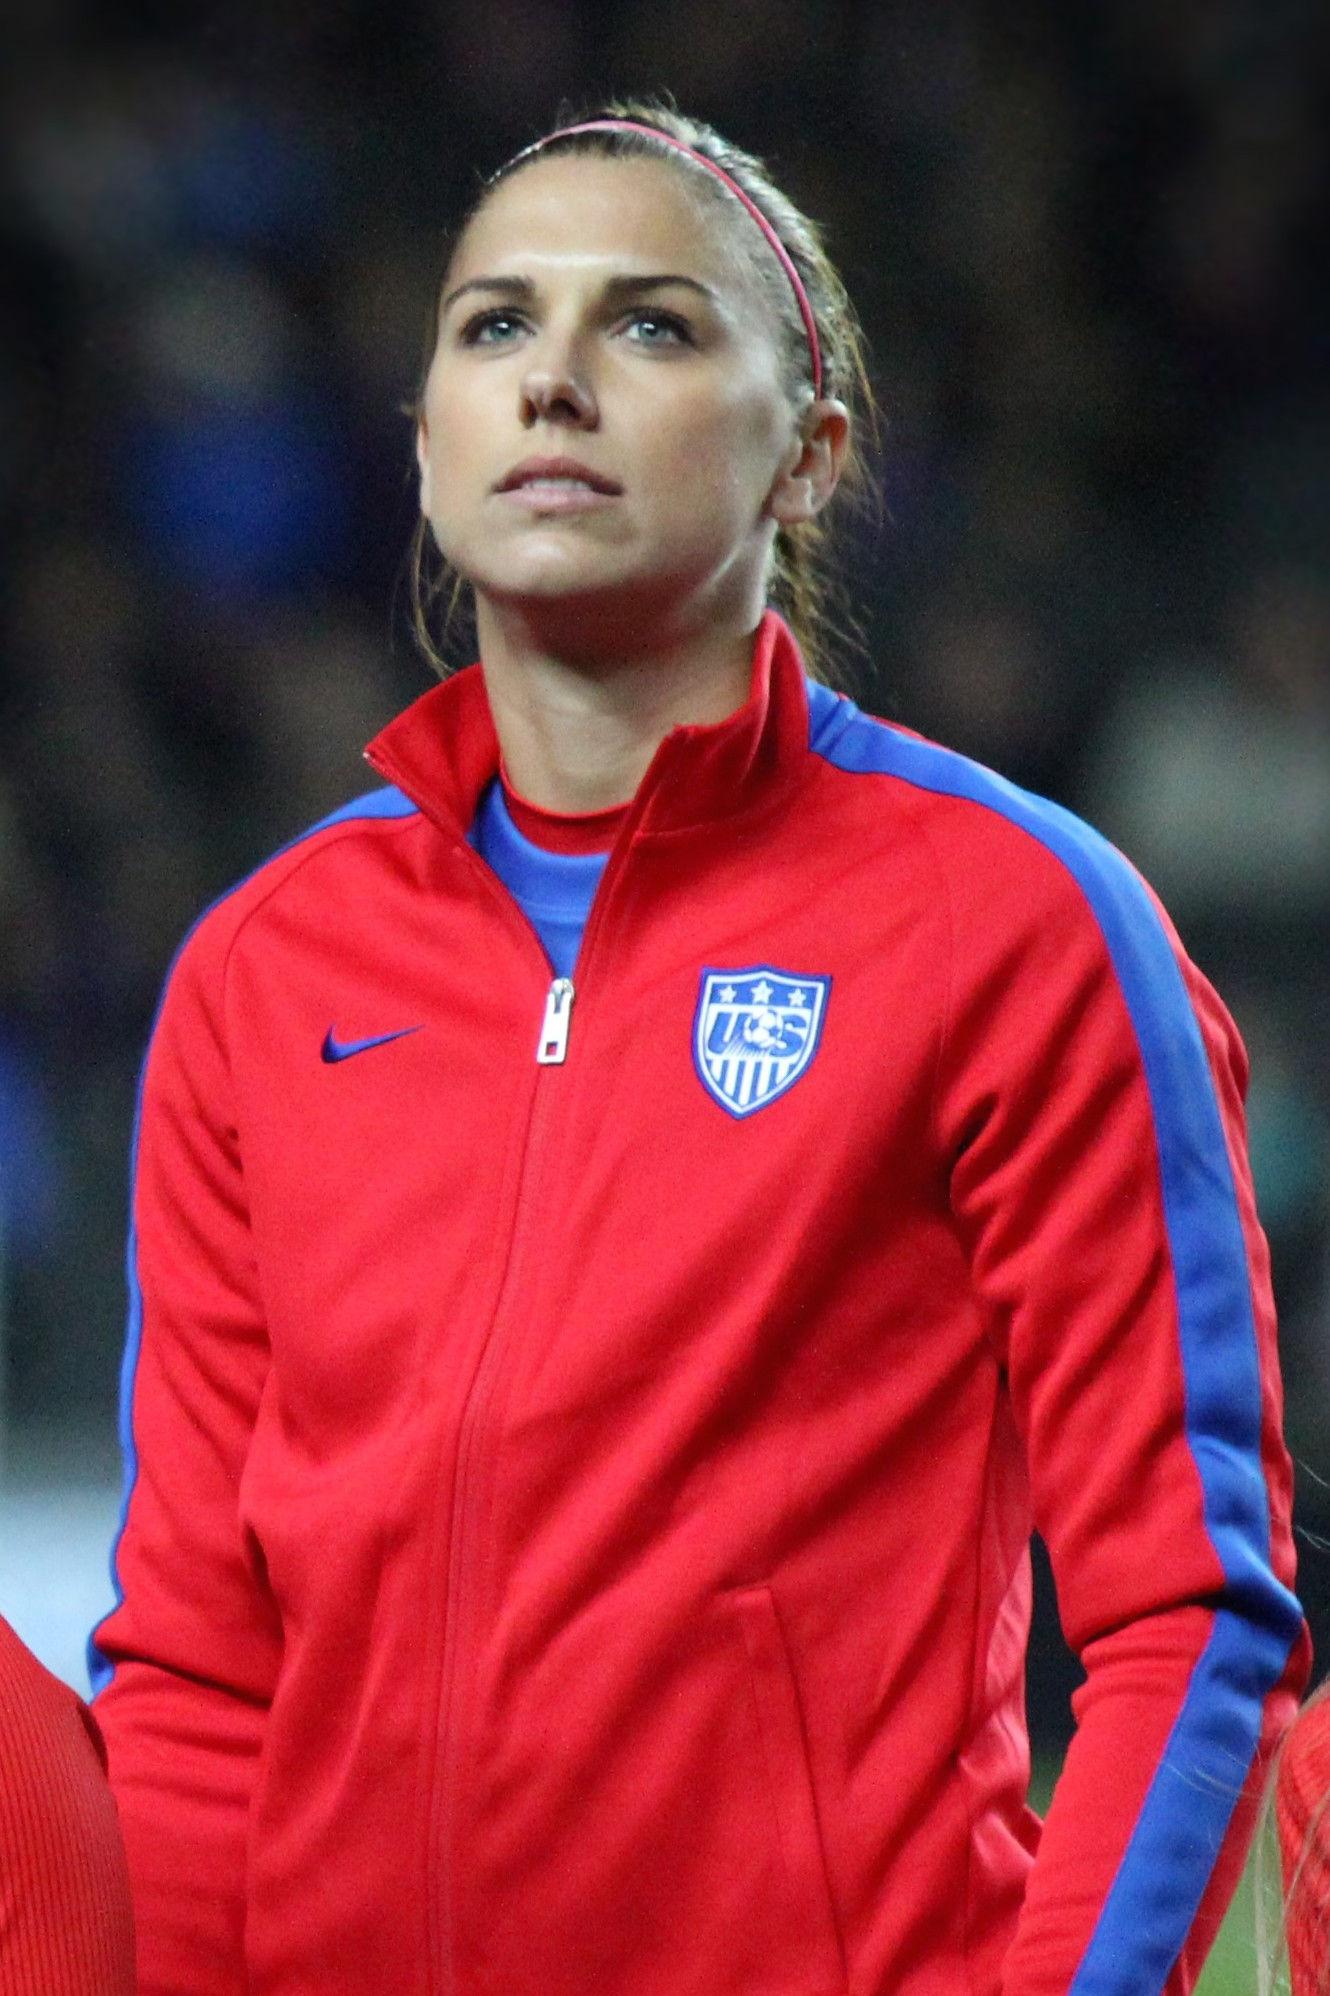 Photo of Alex Morgan: American soccer player